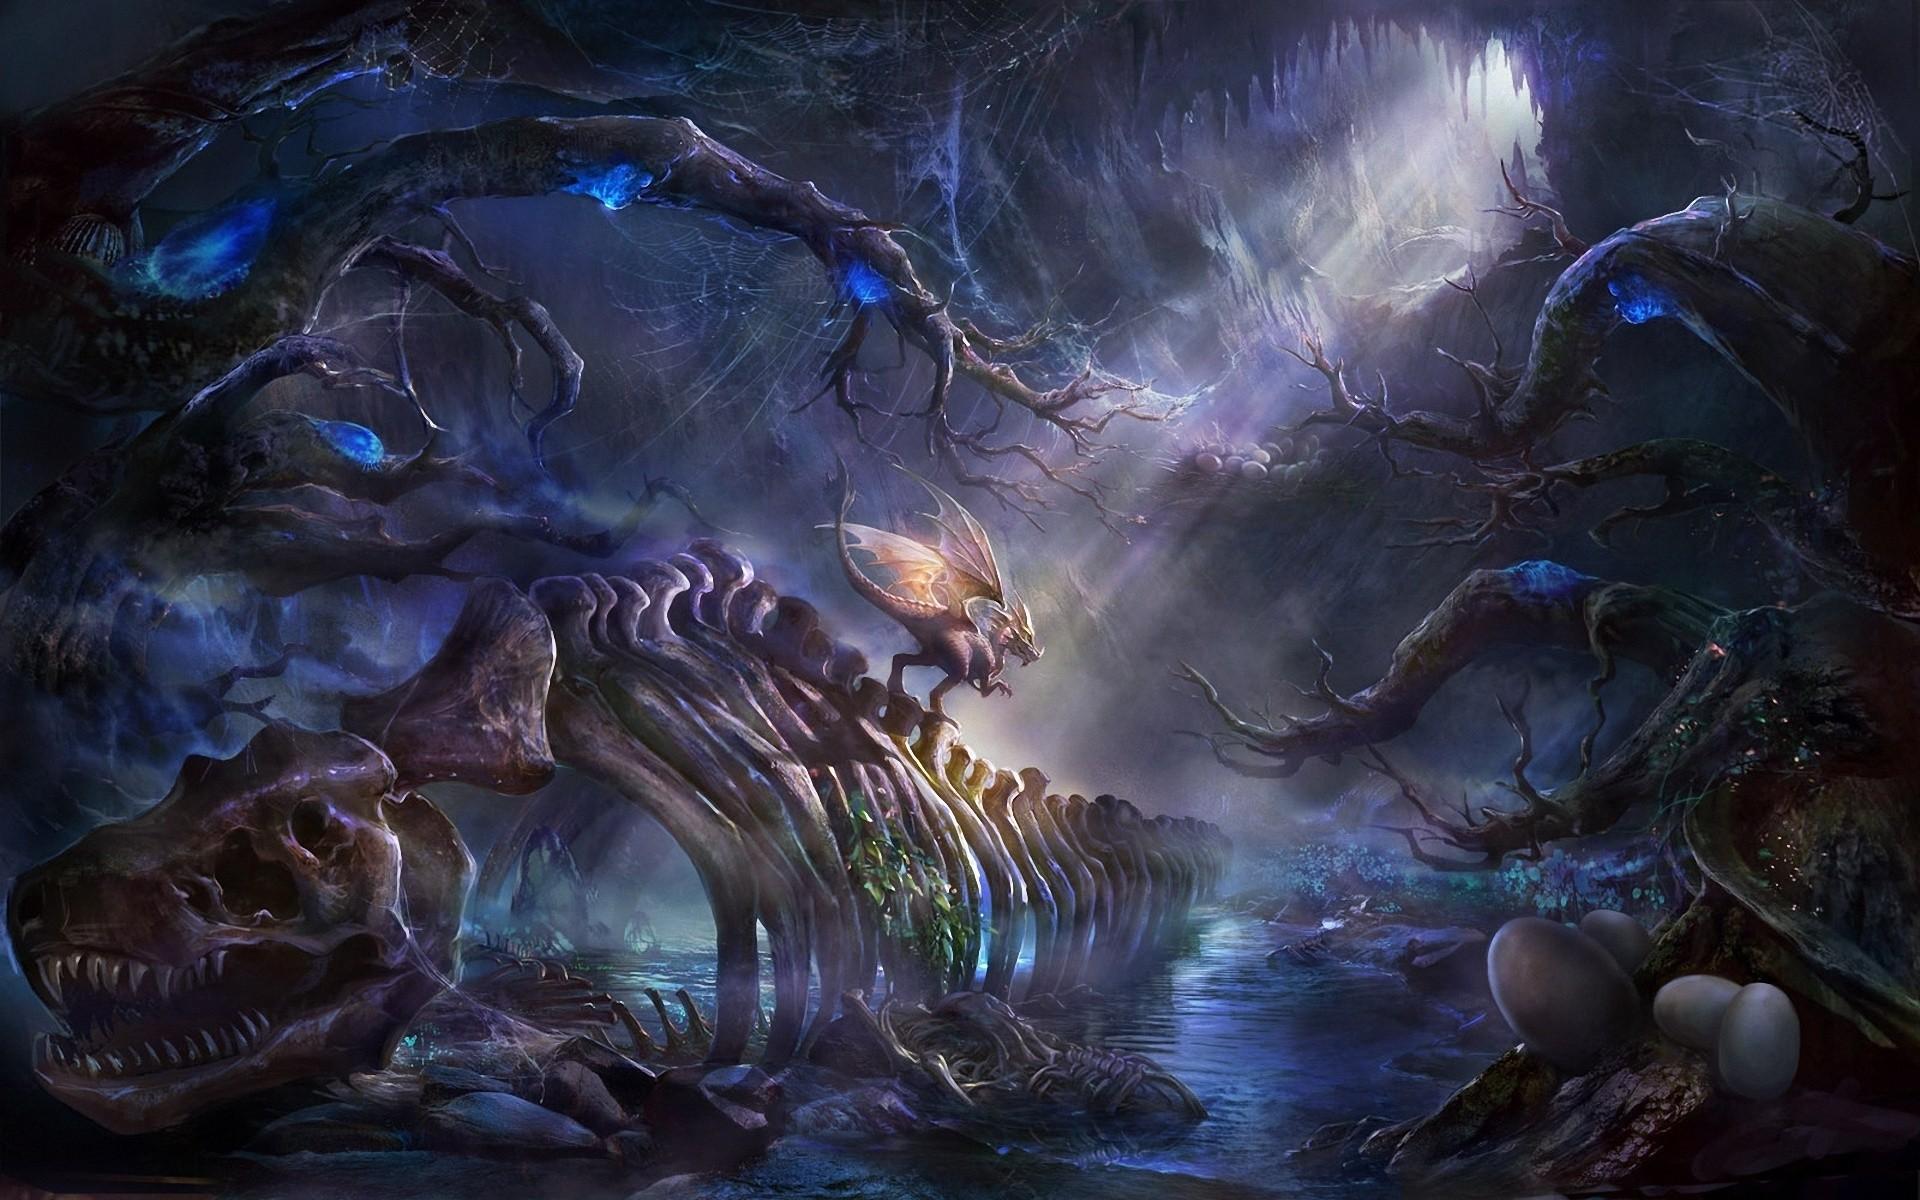 Transformers Fall Of Cybertron Hd Wallpapers 1080p Anime Dragon Wallpaper 183 ①